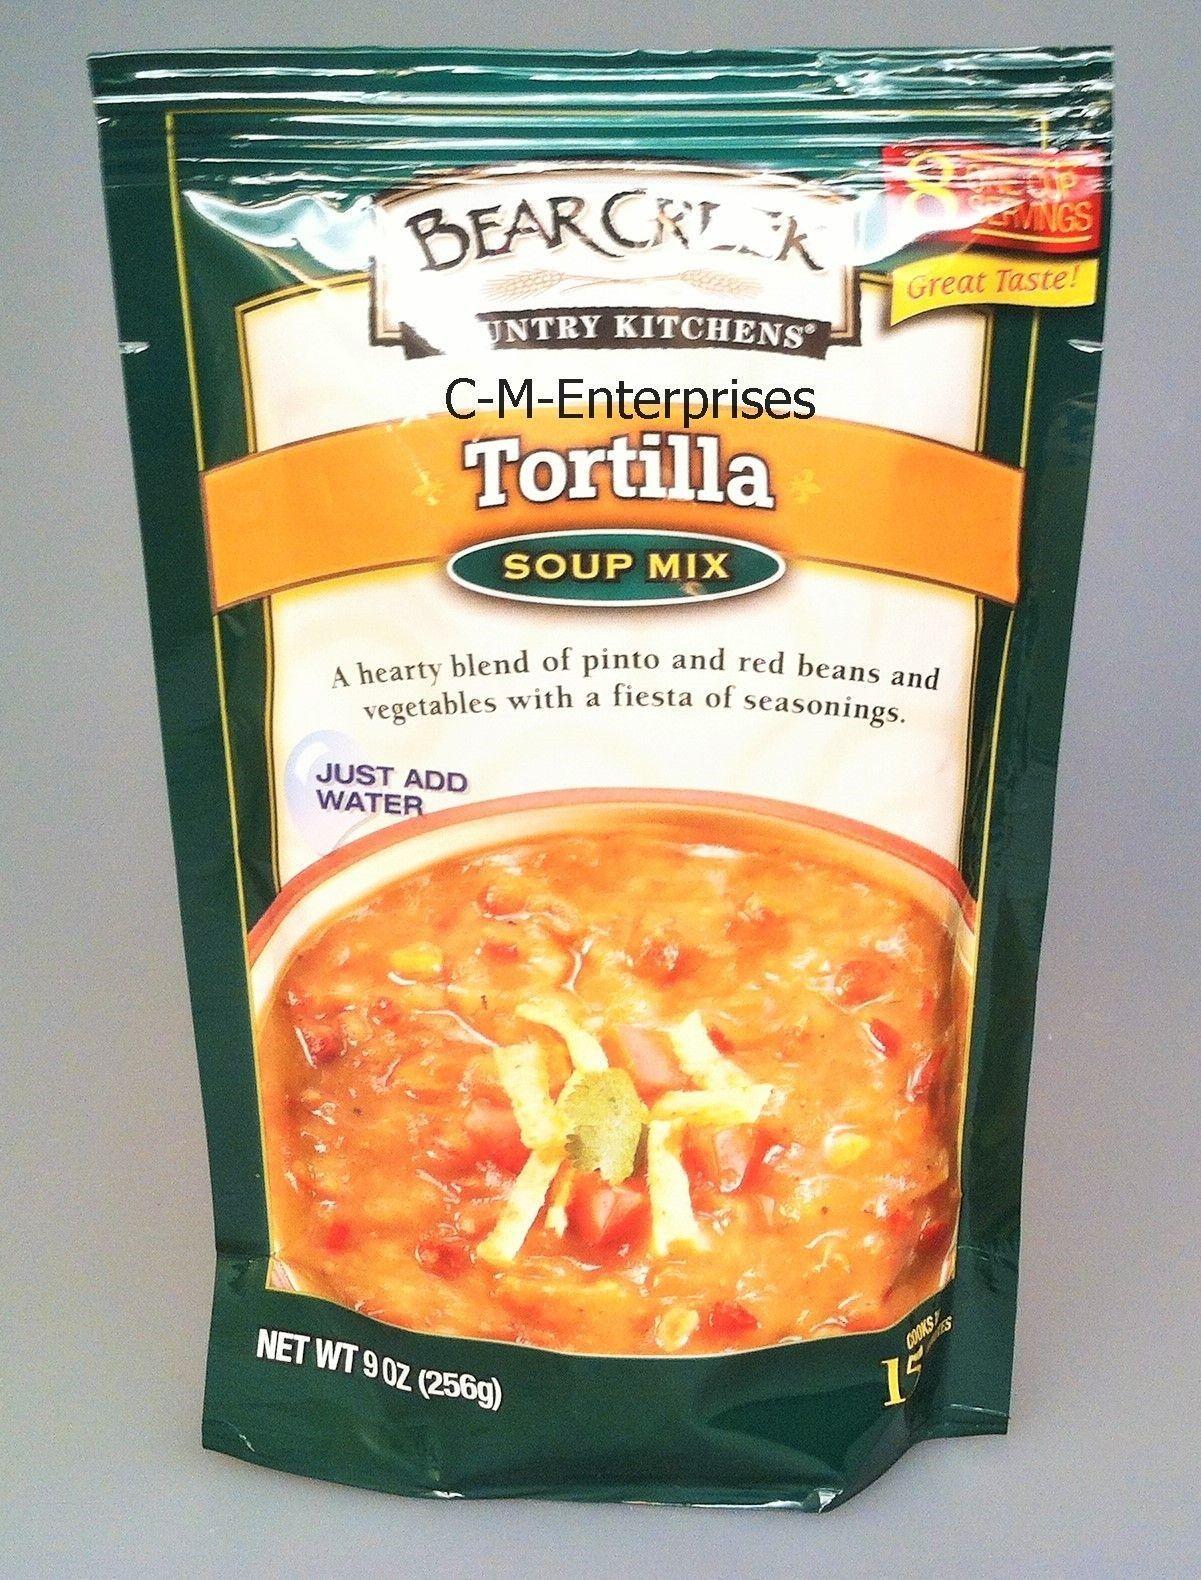 6 41 bear creek country kitchens tortilla soup mix 8 8 oz ebay rh in pinterest com Bear Creek Country Kitchens 10Z Bear Creek Country Kitchens Coupons